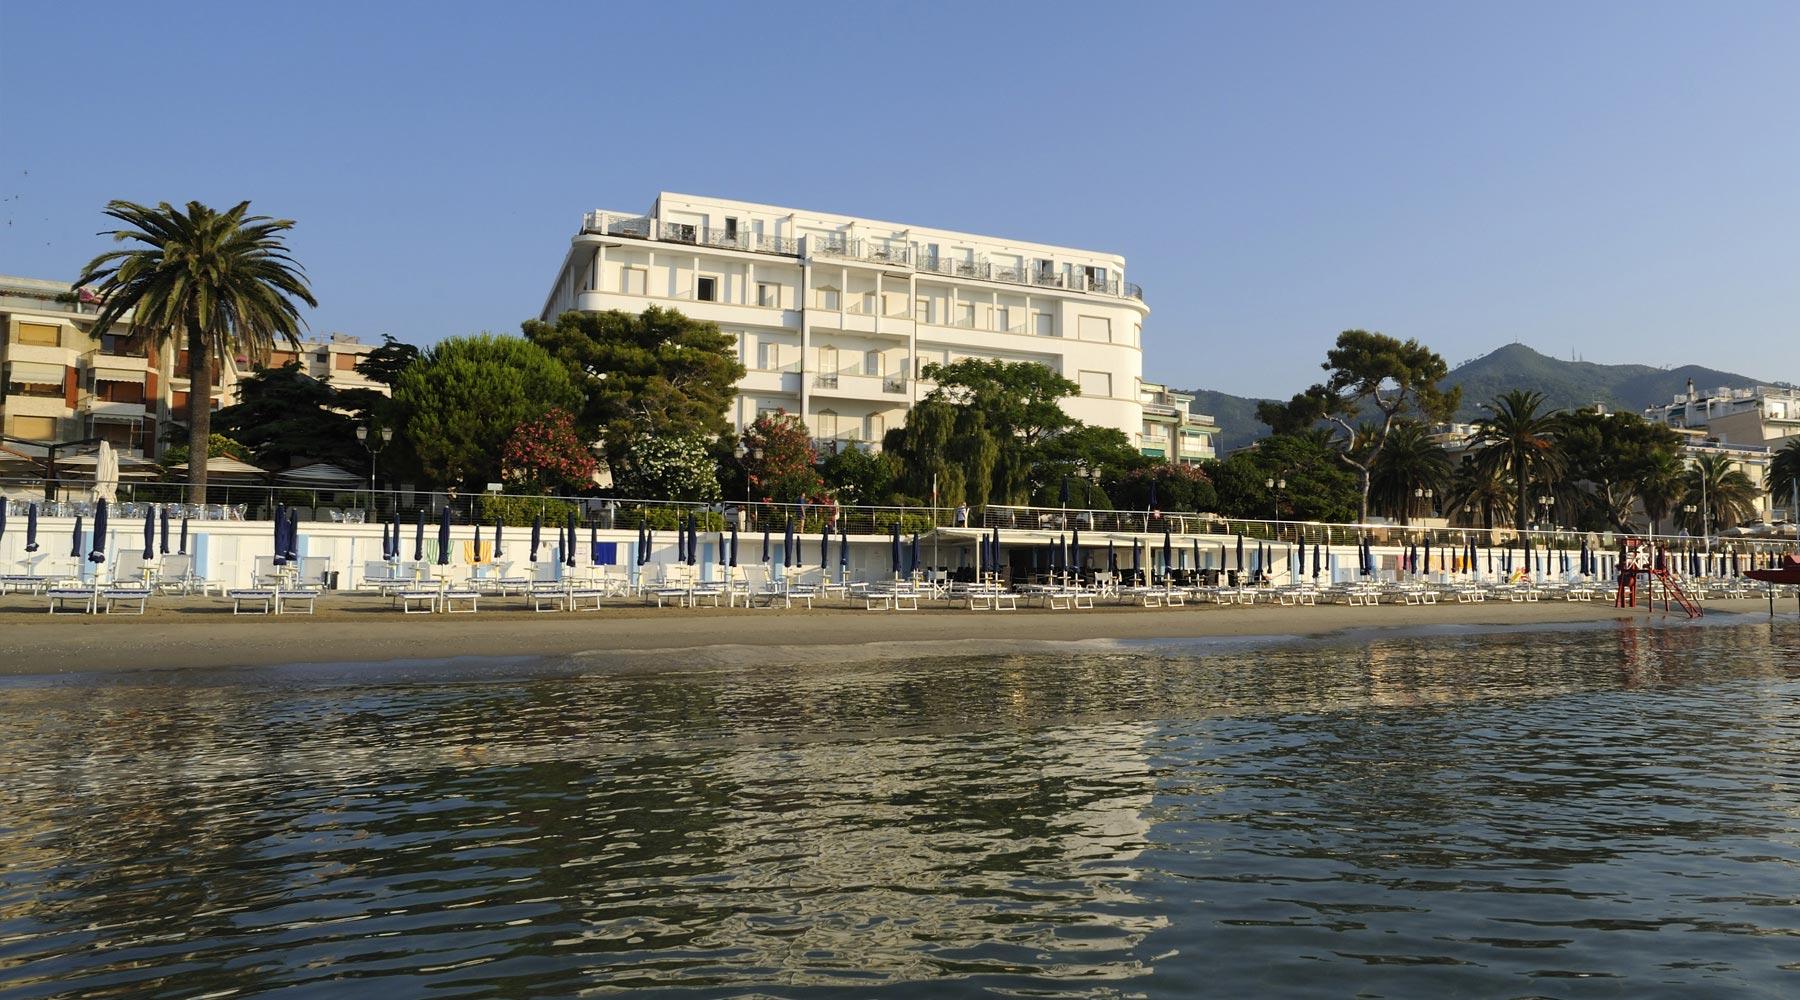 4 Sterne Hotel Am Alassio Italienische Riviera Grand Hotel